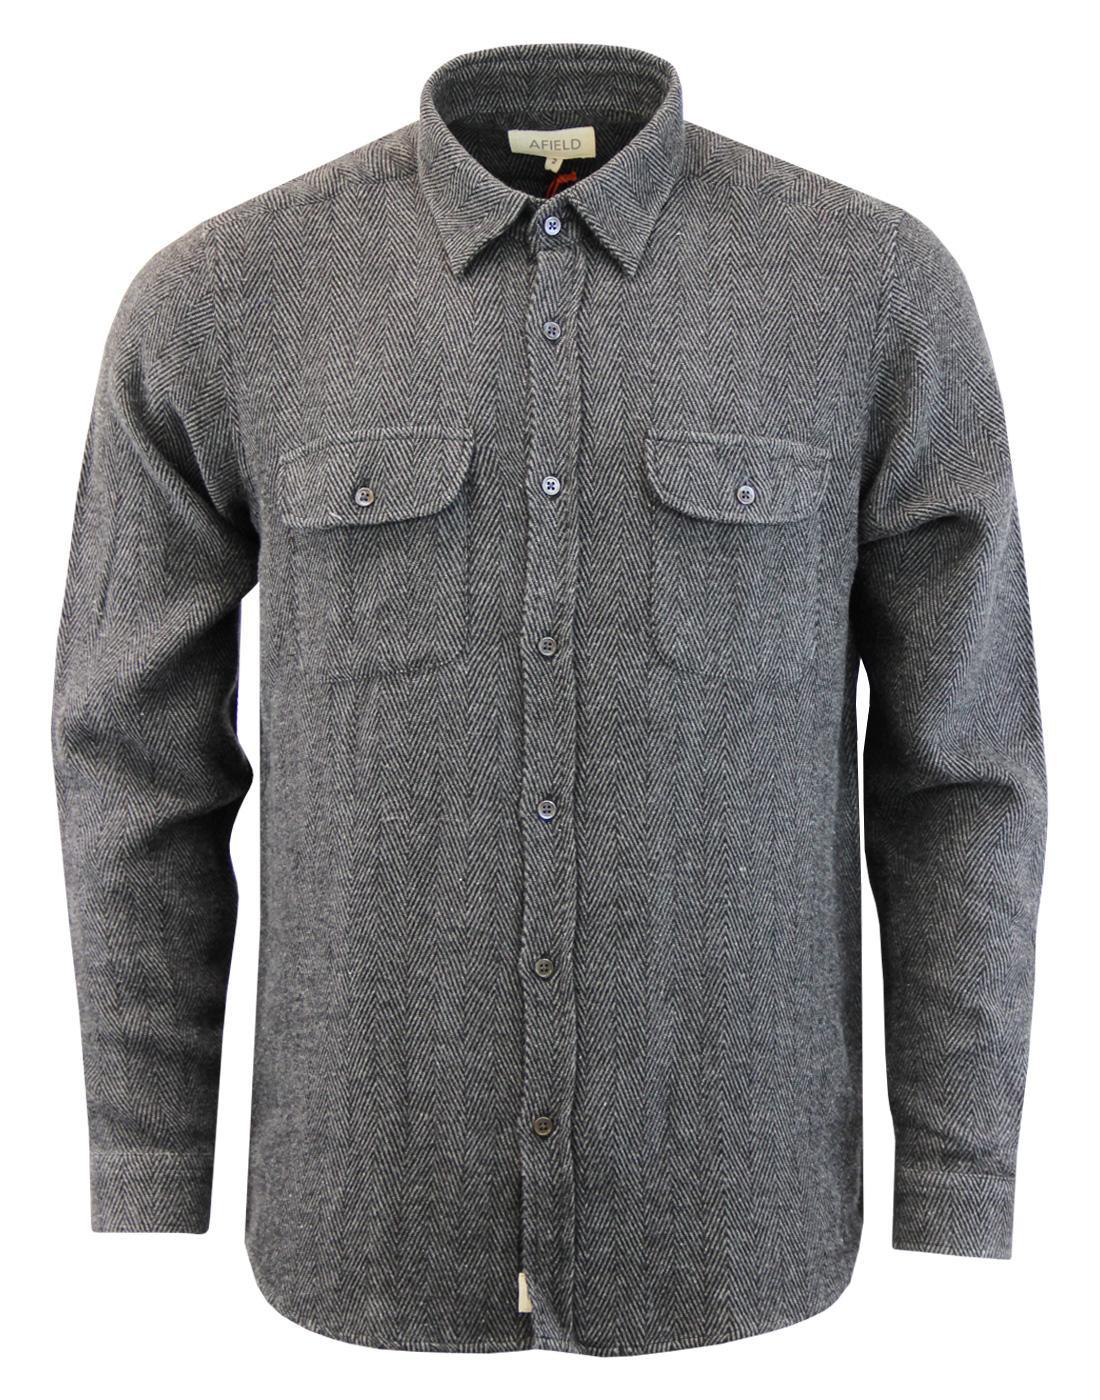 AFIELD Retro Mod Herringbone Stripe Workwear Shirt